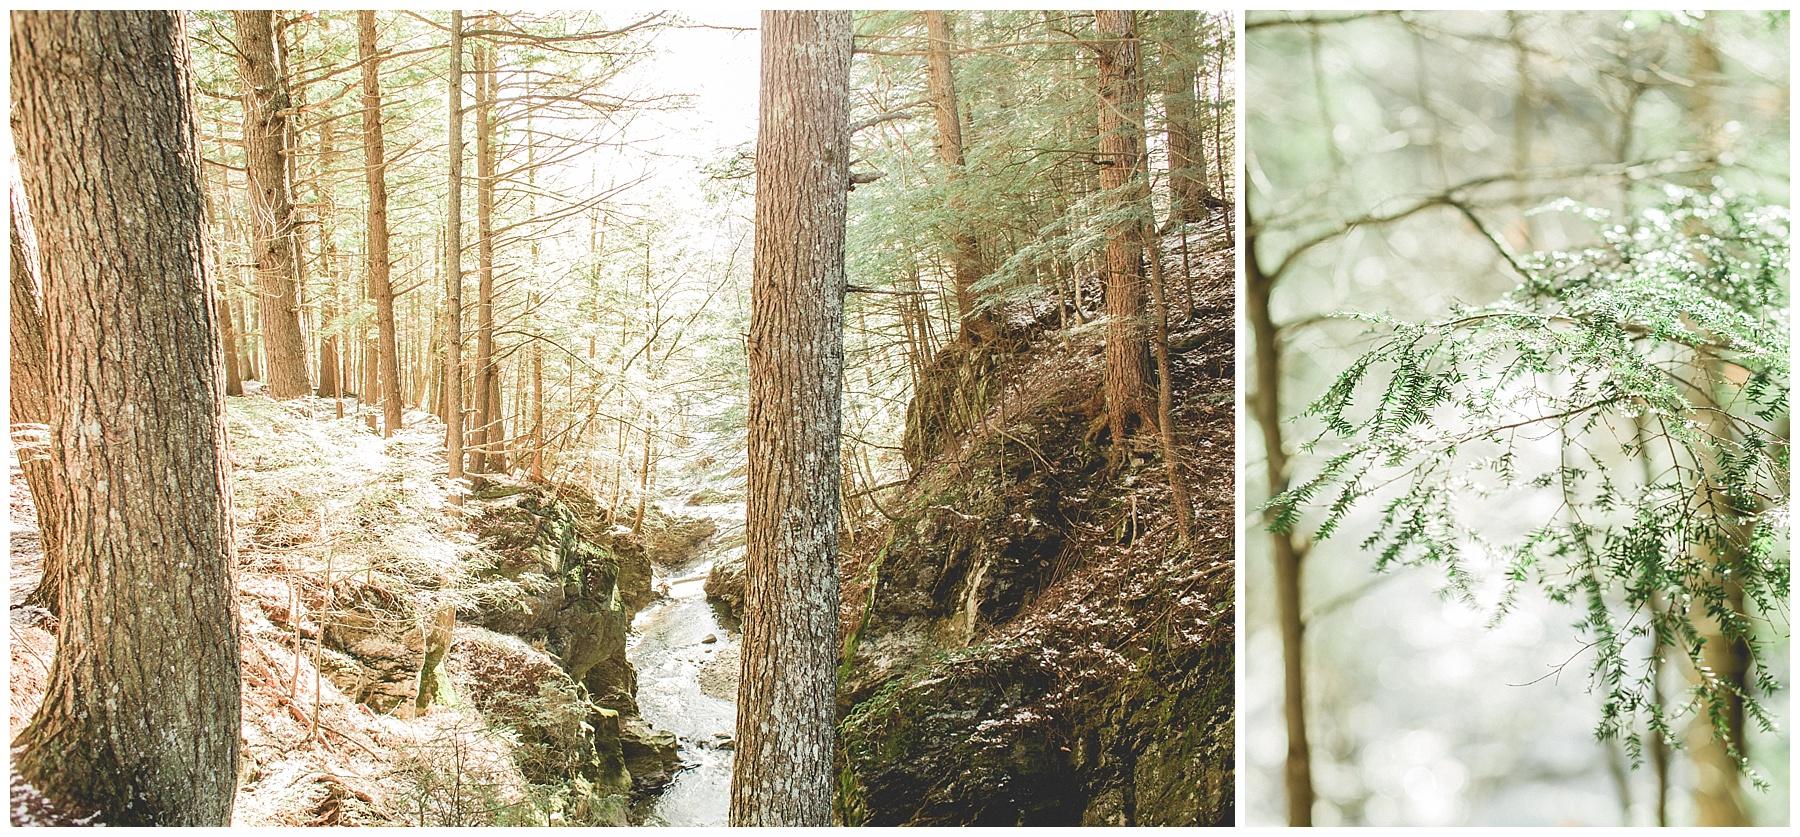 vermont, stowe, engaged, mountains, wanderlove, discoverwanderlove, beauty, proposal, proposal story, ben and jerrys, icecream, rec path, moss glenn falls, waterfall, hike, hiking